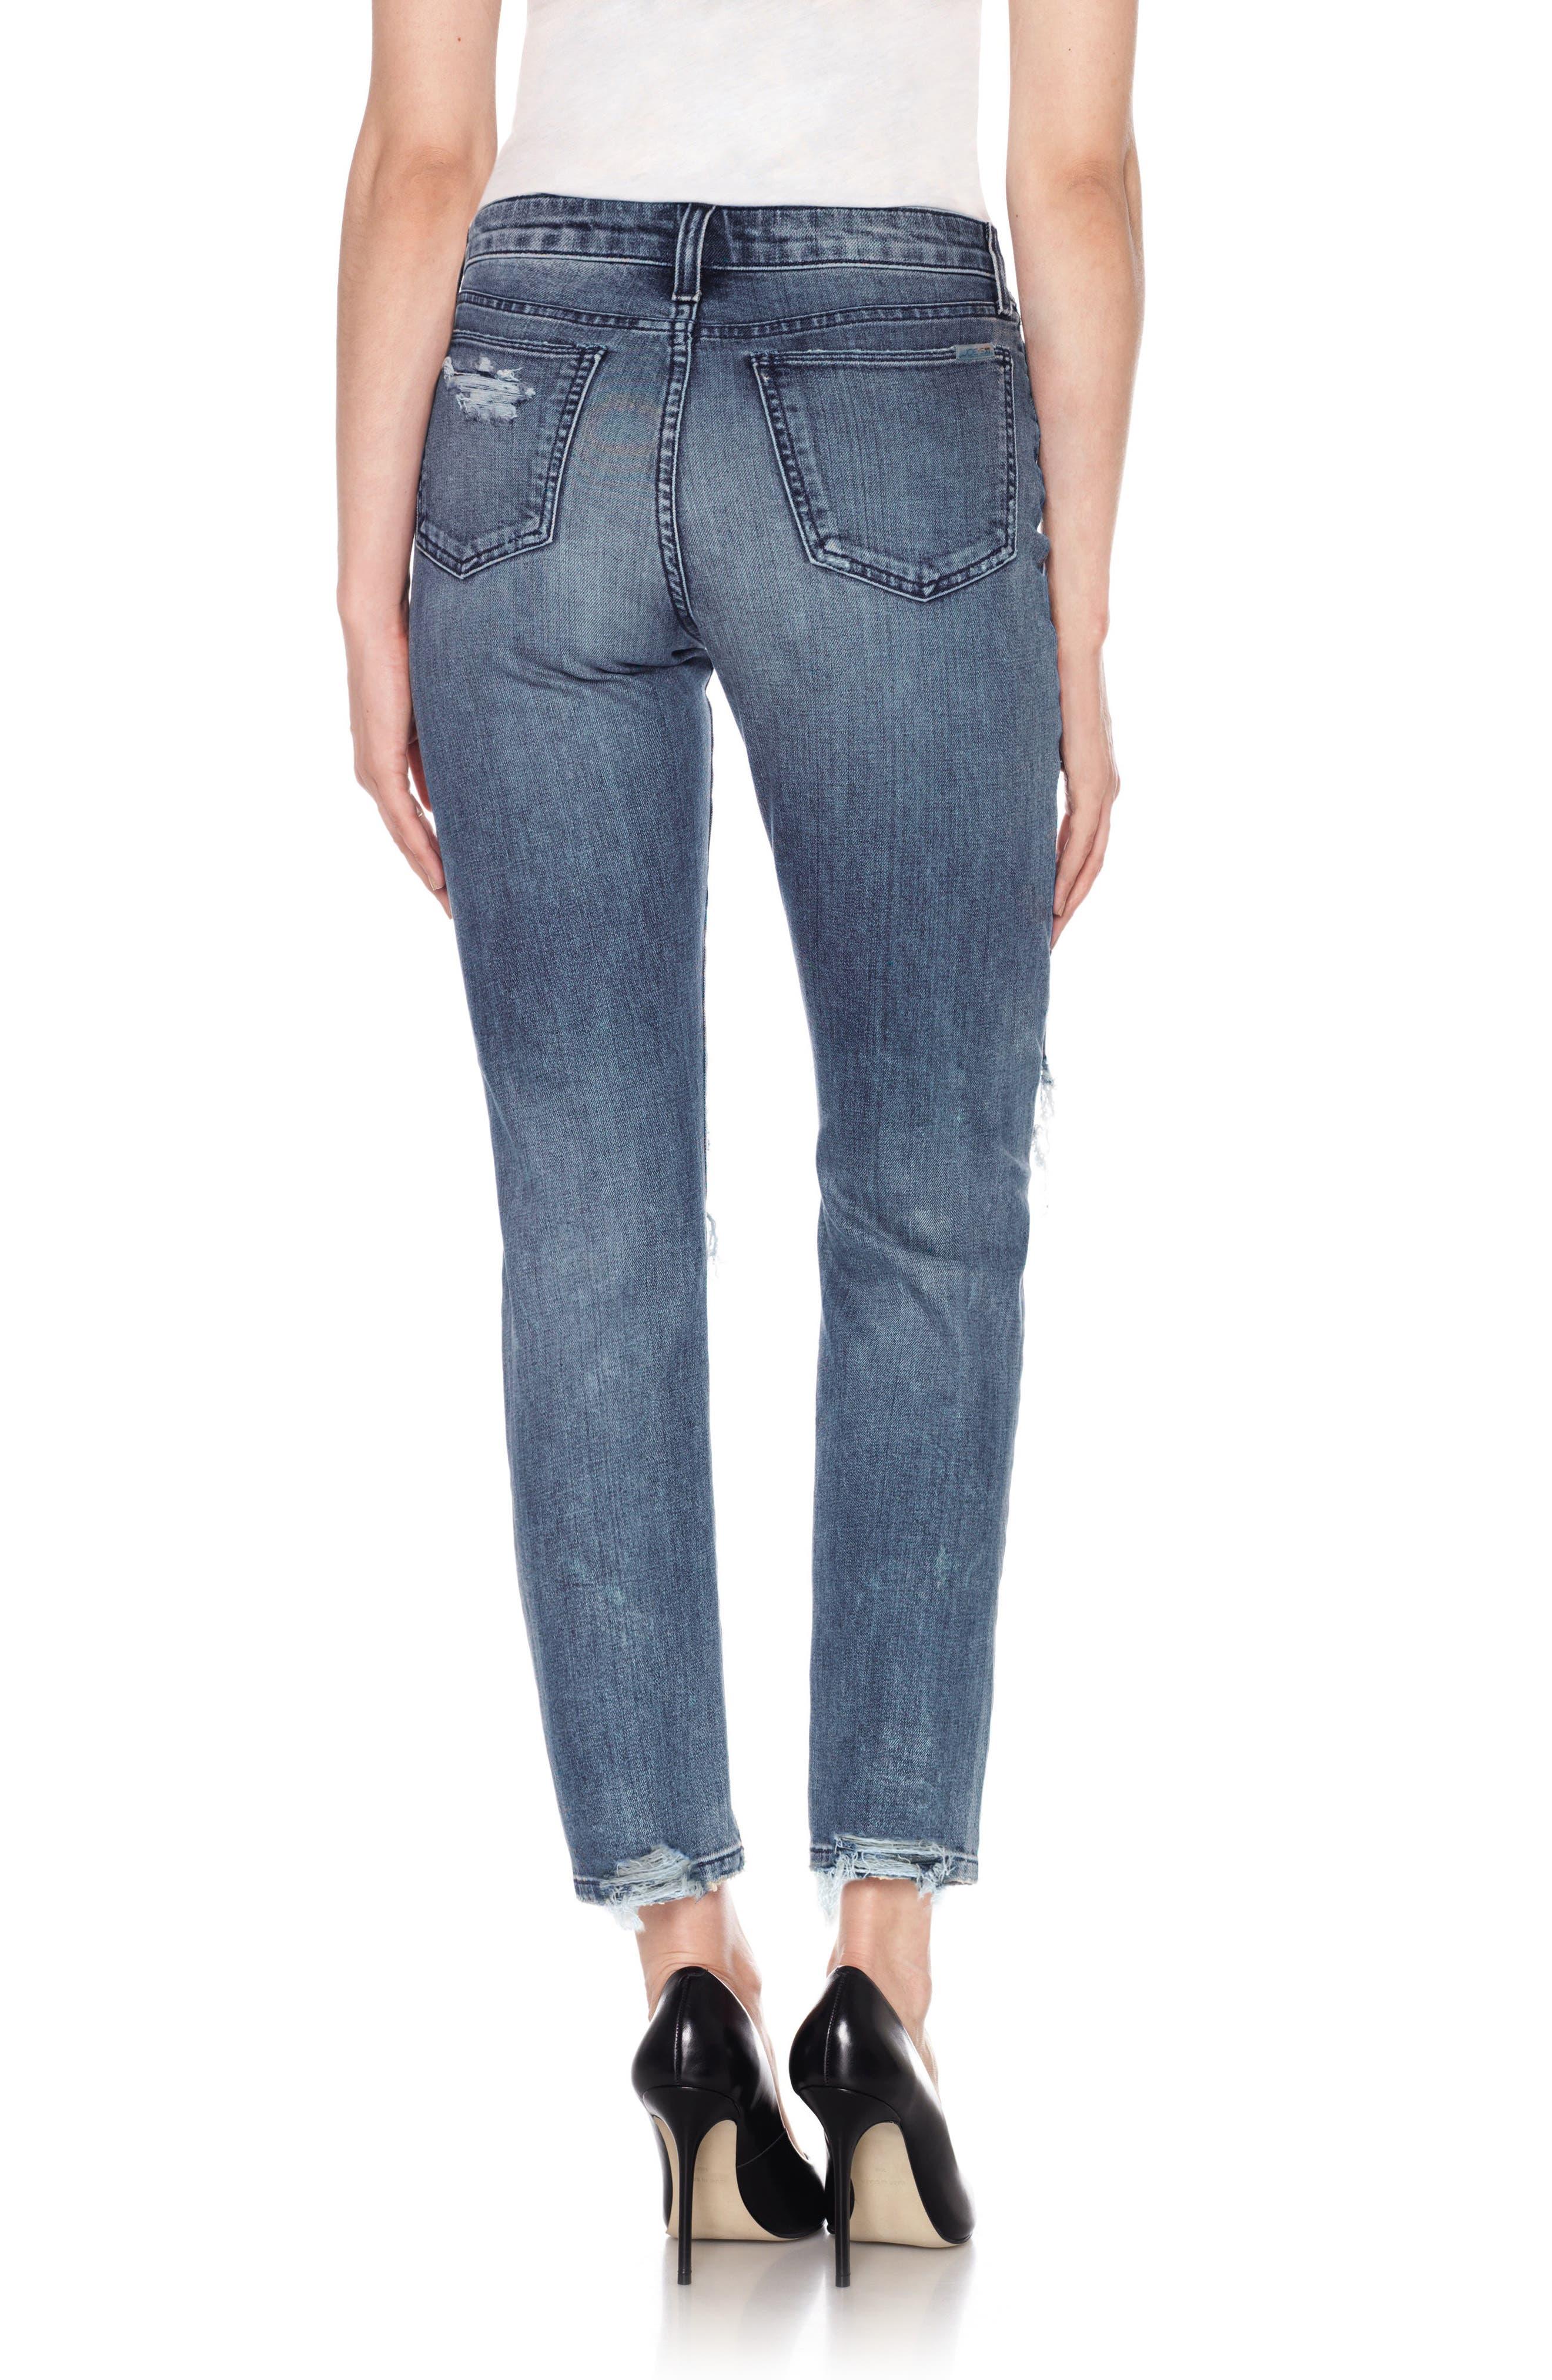 Kass Ankle Skinny Jeans,                             Alternate thumbnail 2, color,                             415